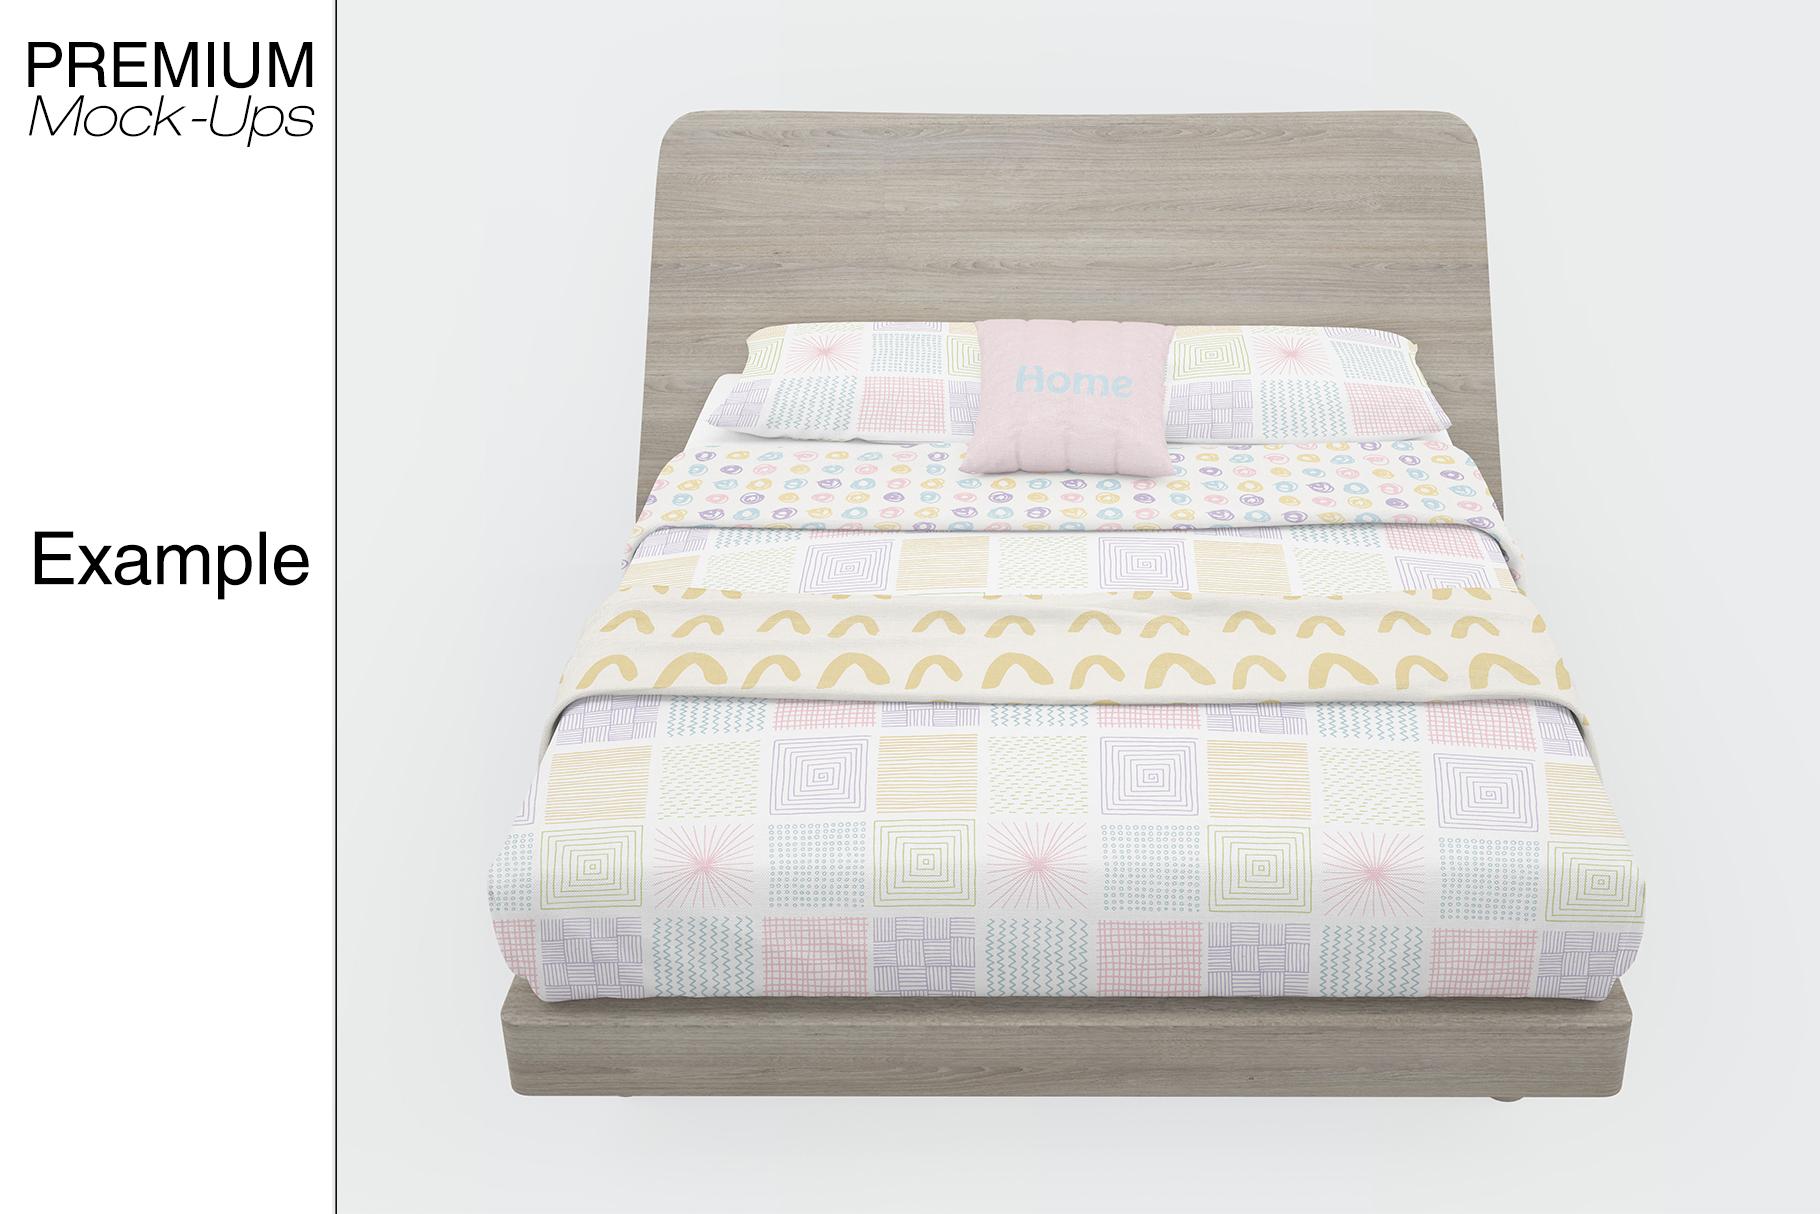 Bedding Mockup Set example image 4